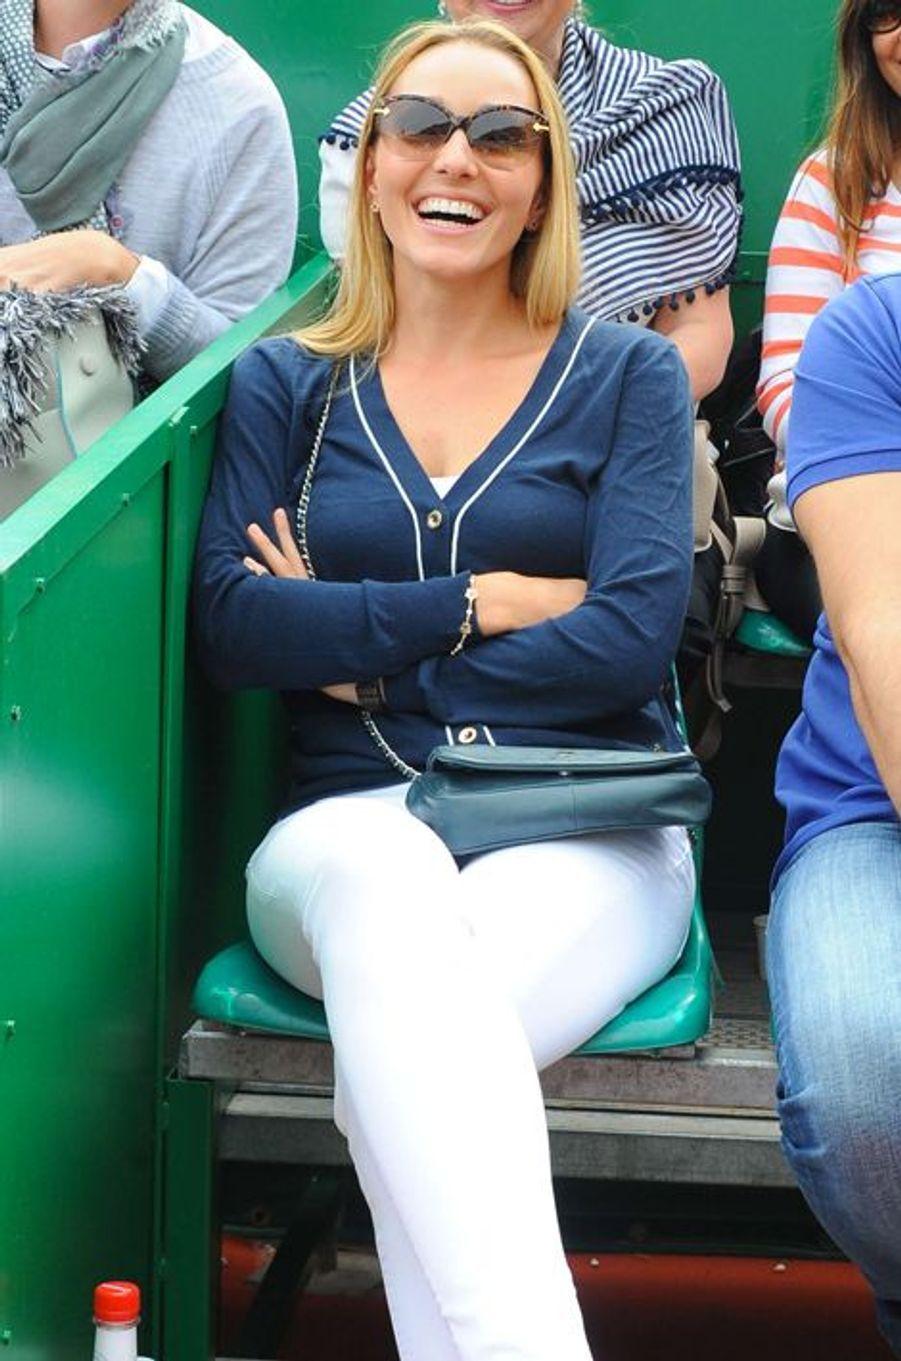 Jelena Ristic, la femme de Novak Djokovic